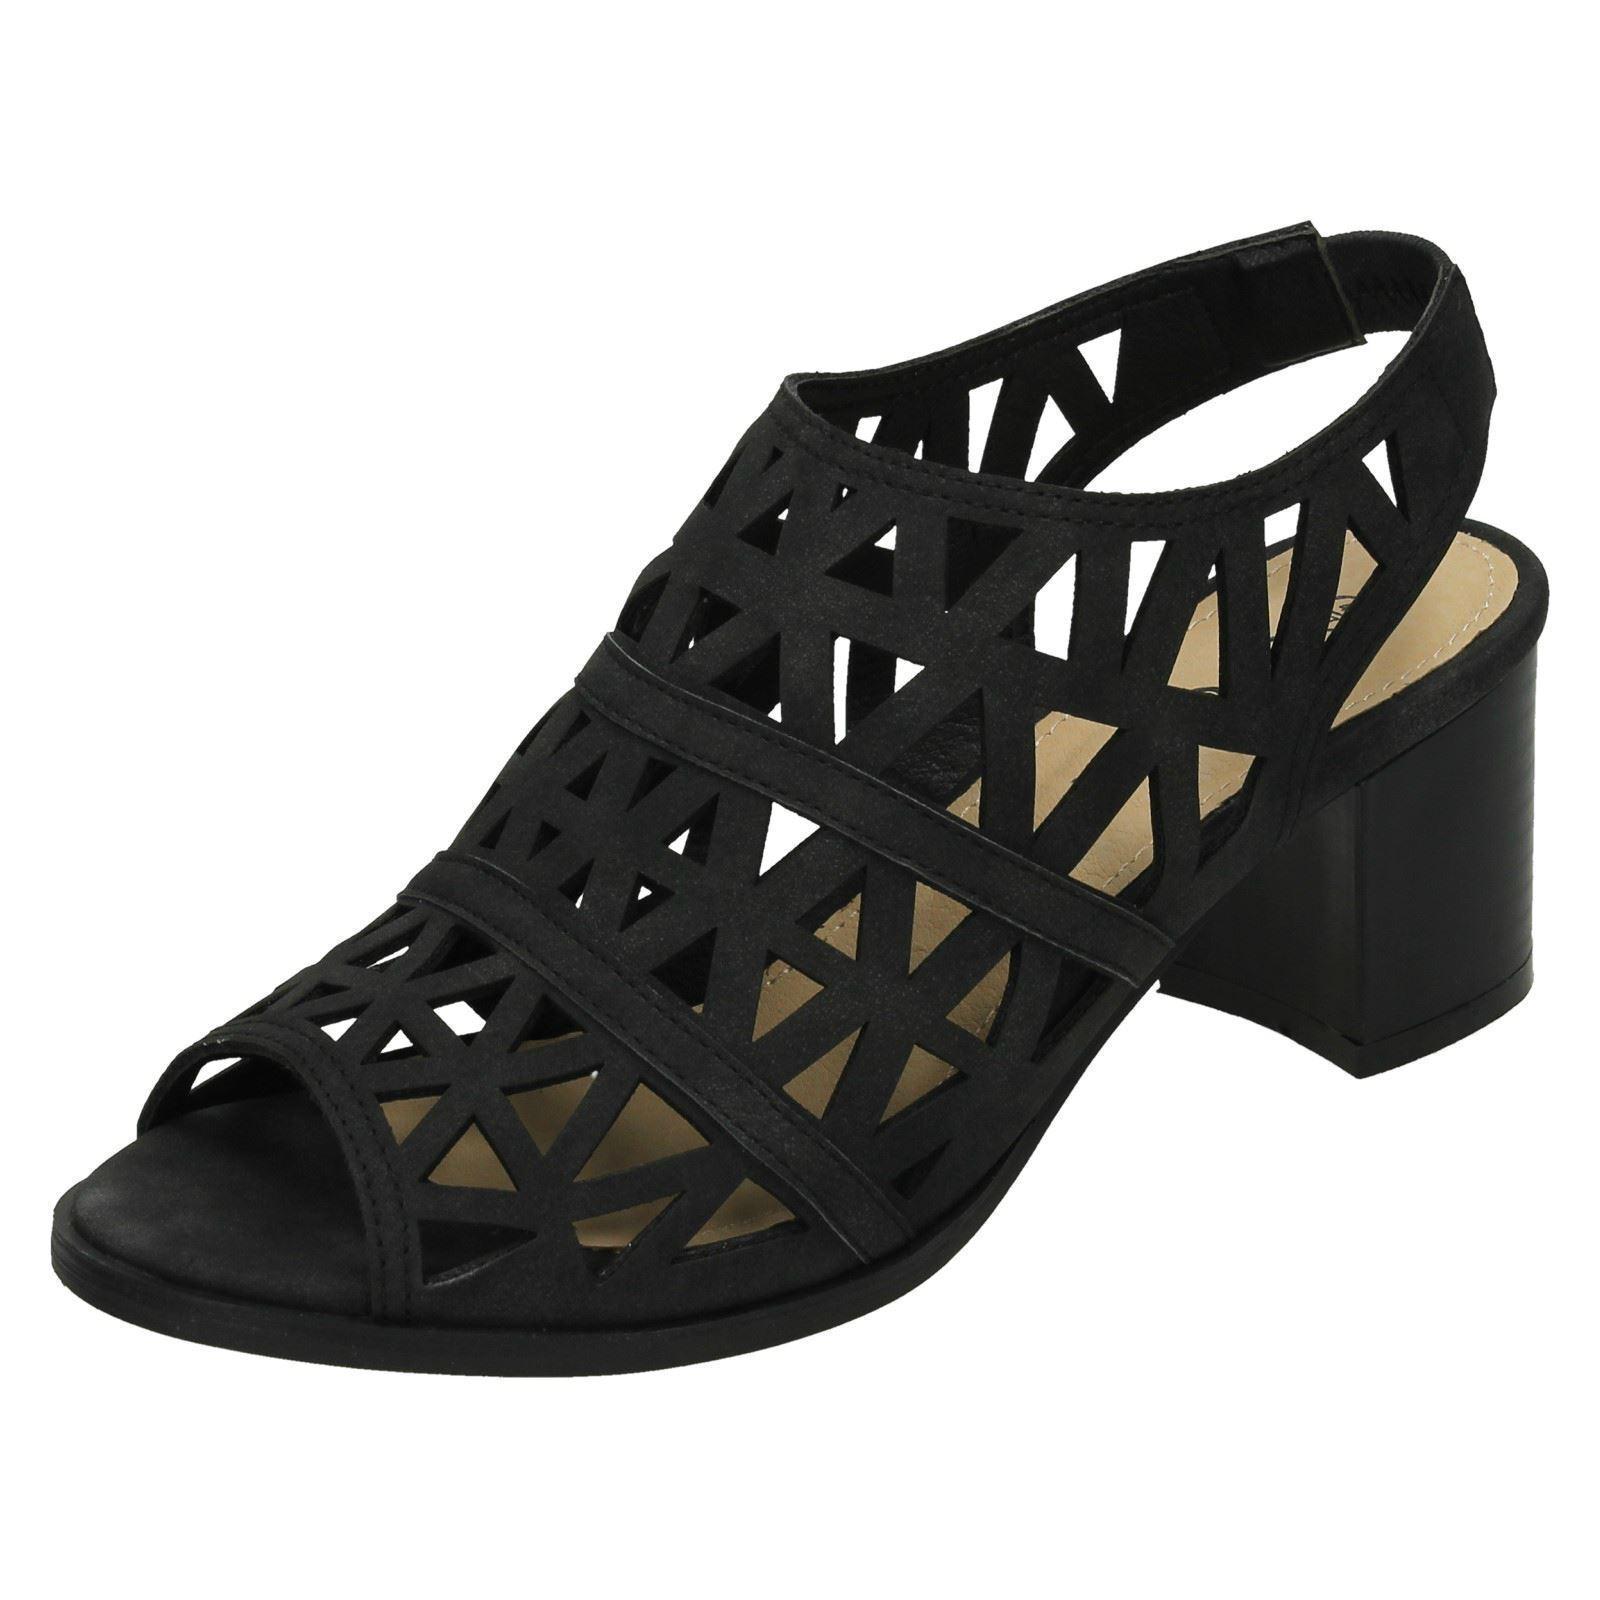 Spot Ladies On F10635 Ladies Spot Black Block Heel Sandals 2c4edf